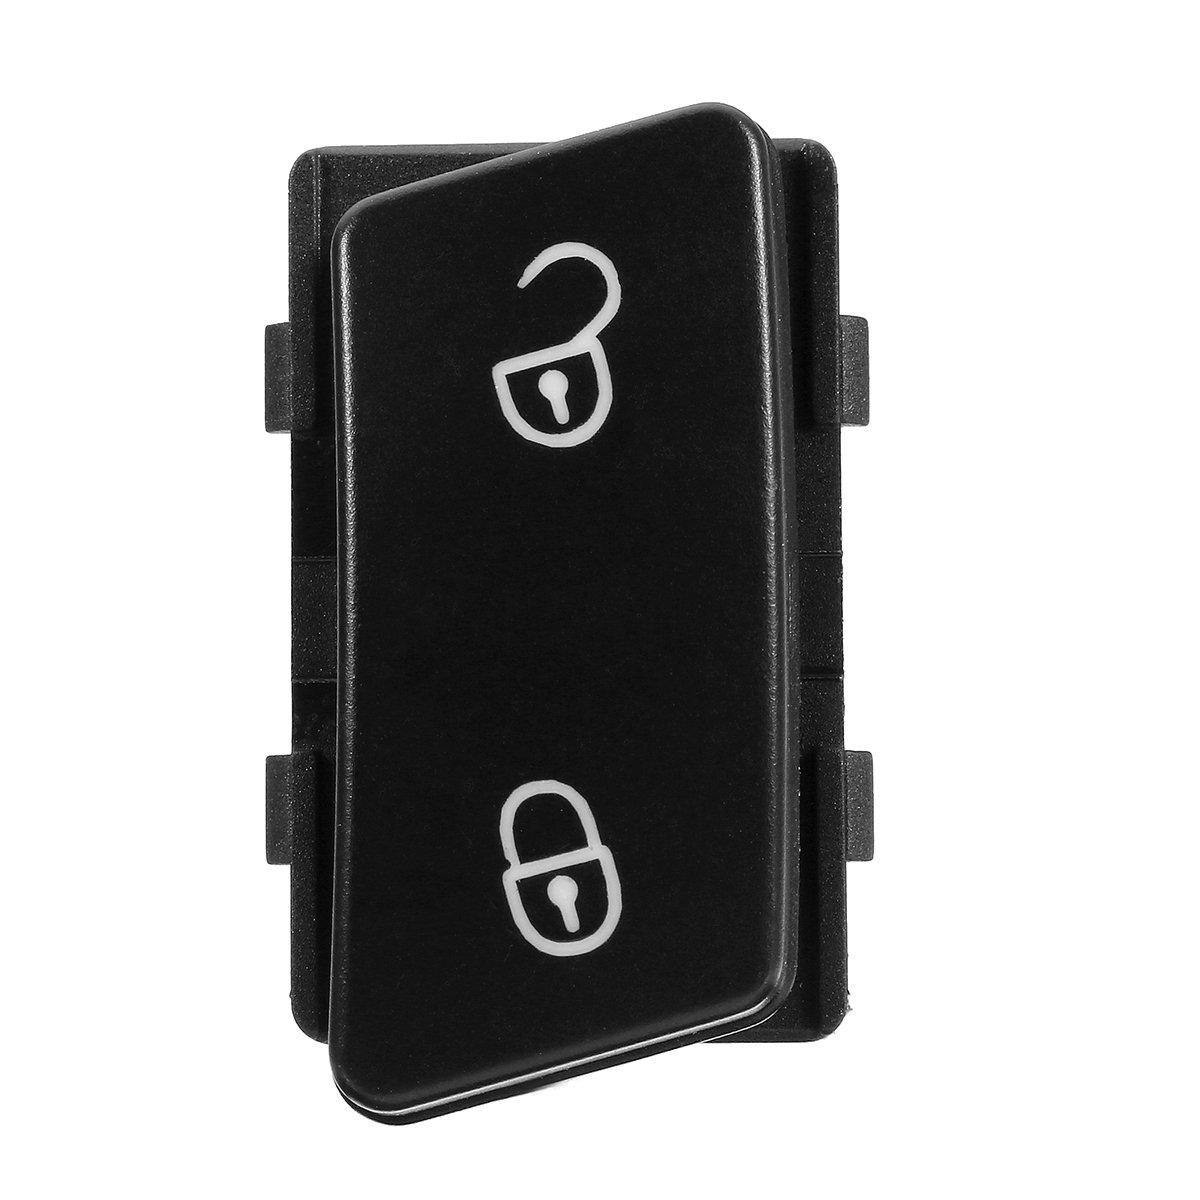 MONNY 1pcs Car Door Control Central Lock Unlock Switch Button Safety for Volkswagen VW/Touran 1TD 962 125C 1T0 962 125B